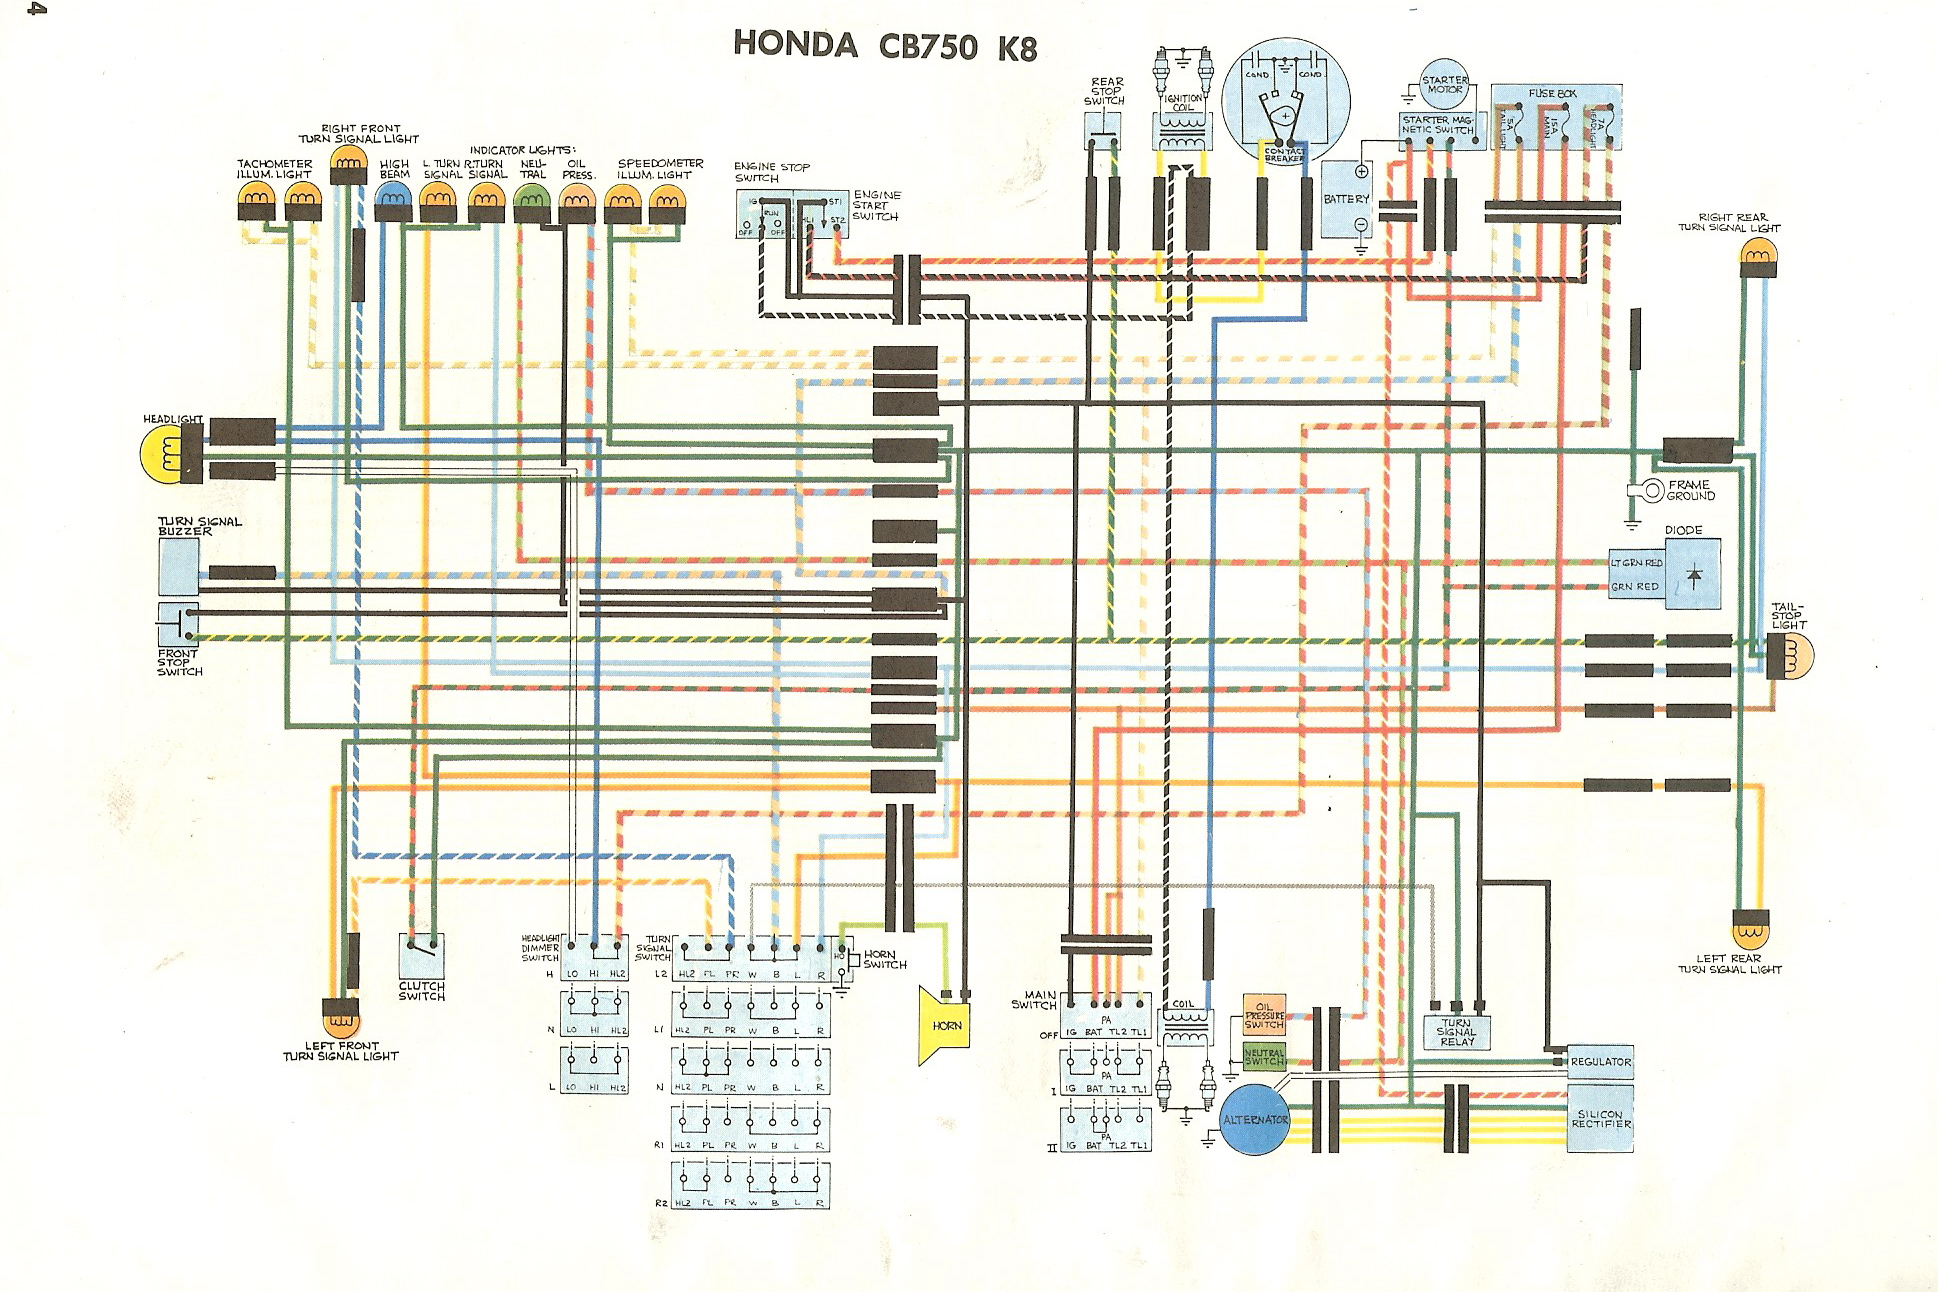 Cb750 Simplified Wiring Diagram